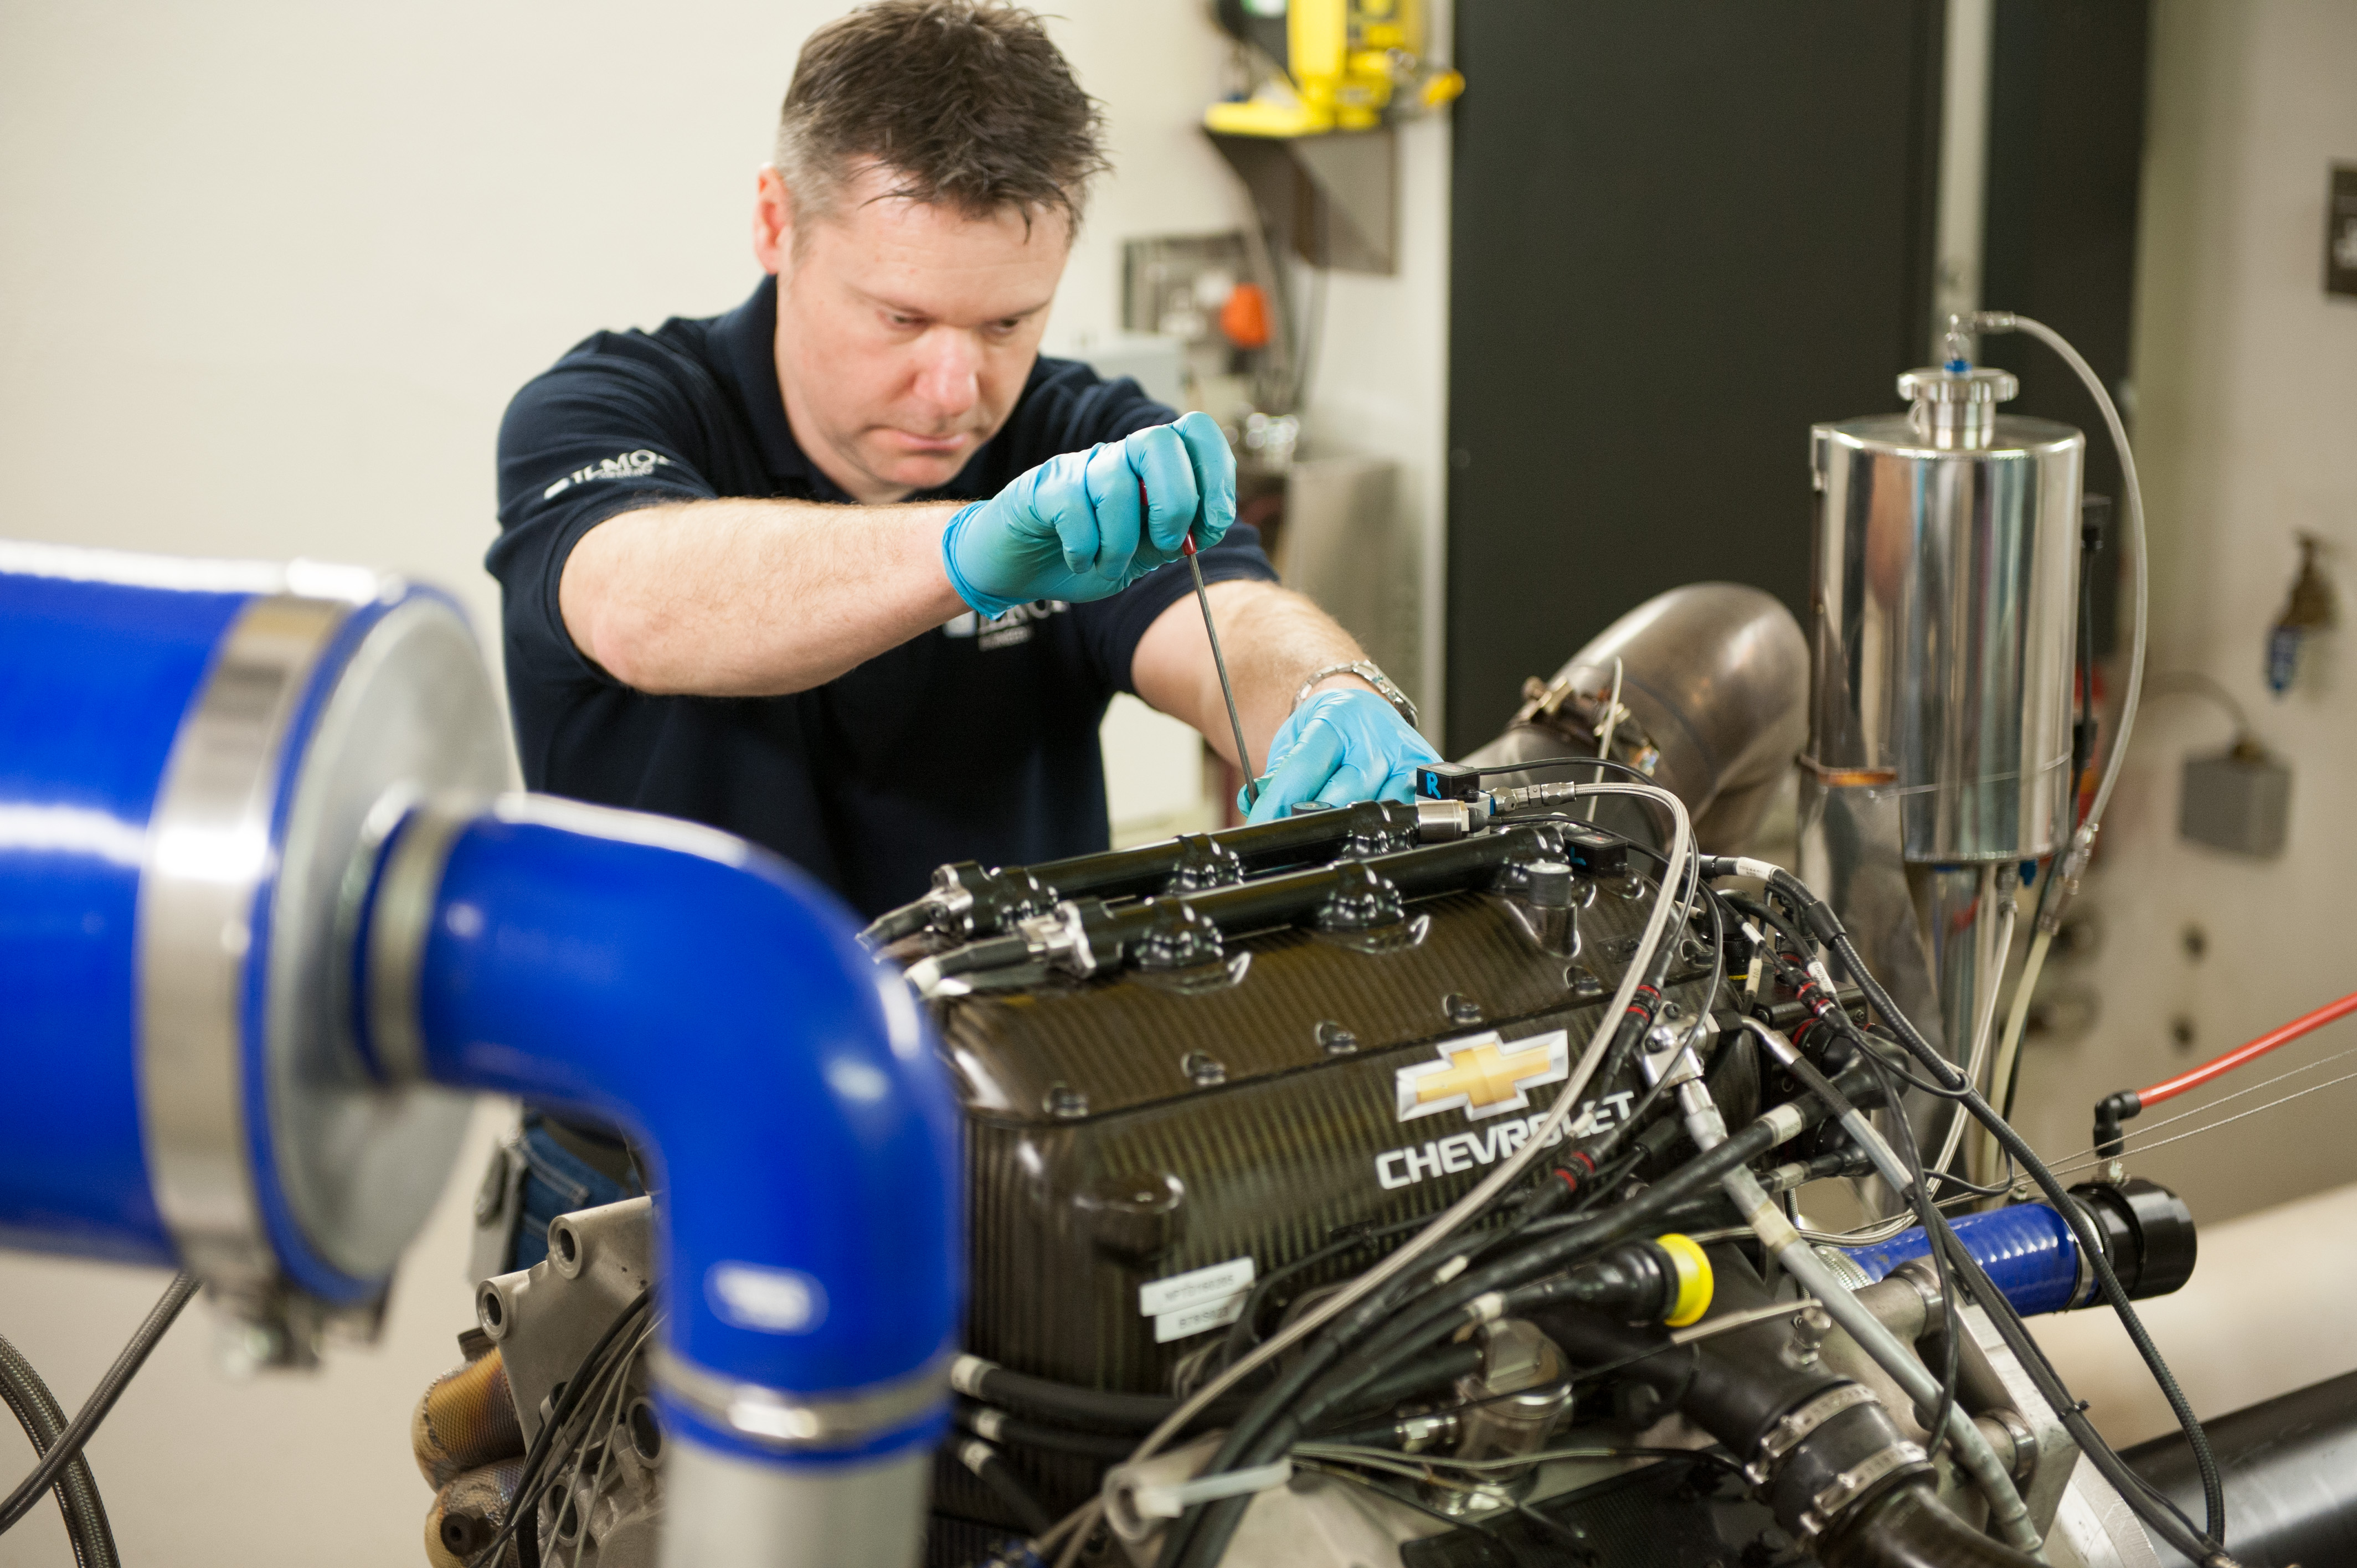 Chevrolet IndyCar engine on the dyno at Ilmor